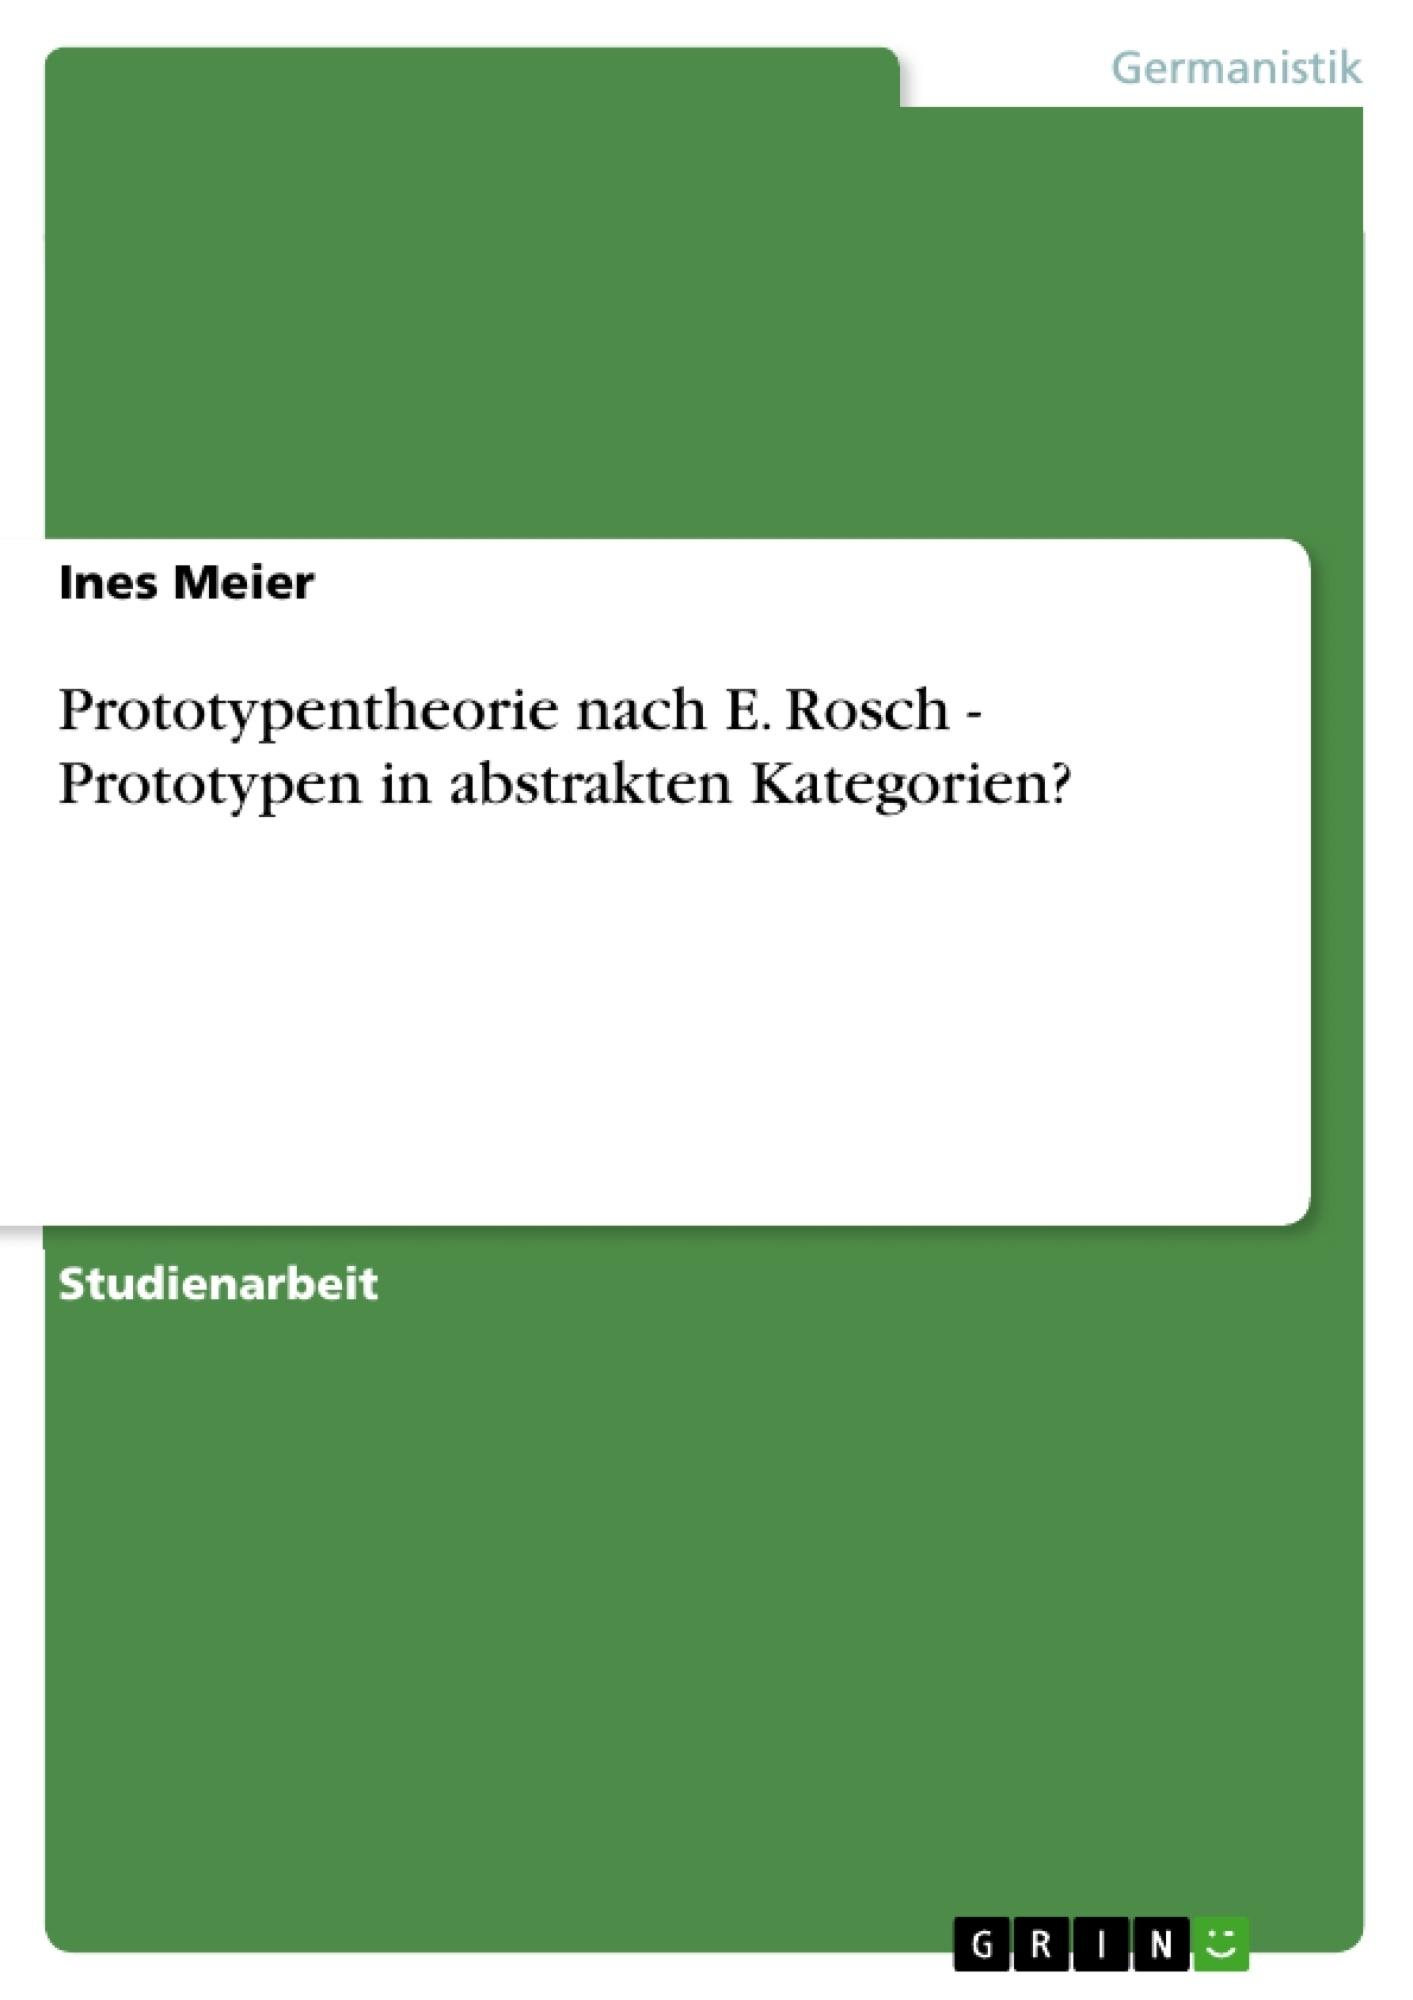 Titel: Prototypentheorie nach E. Rosch - Prototypen in abstrakten Kategorien?